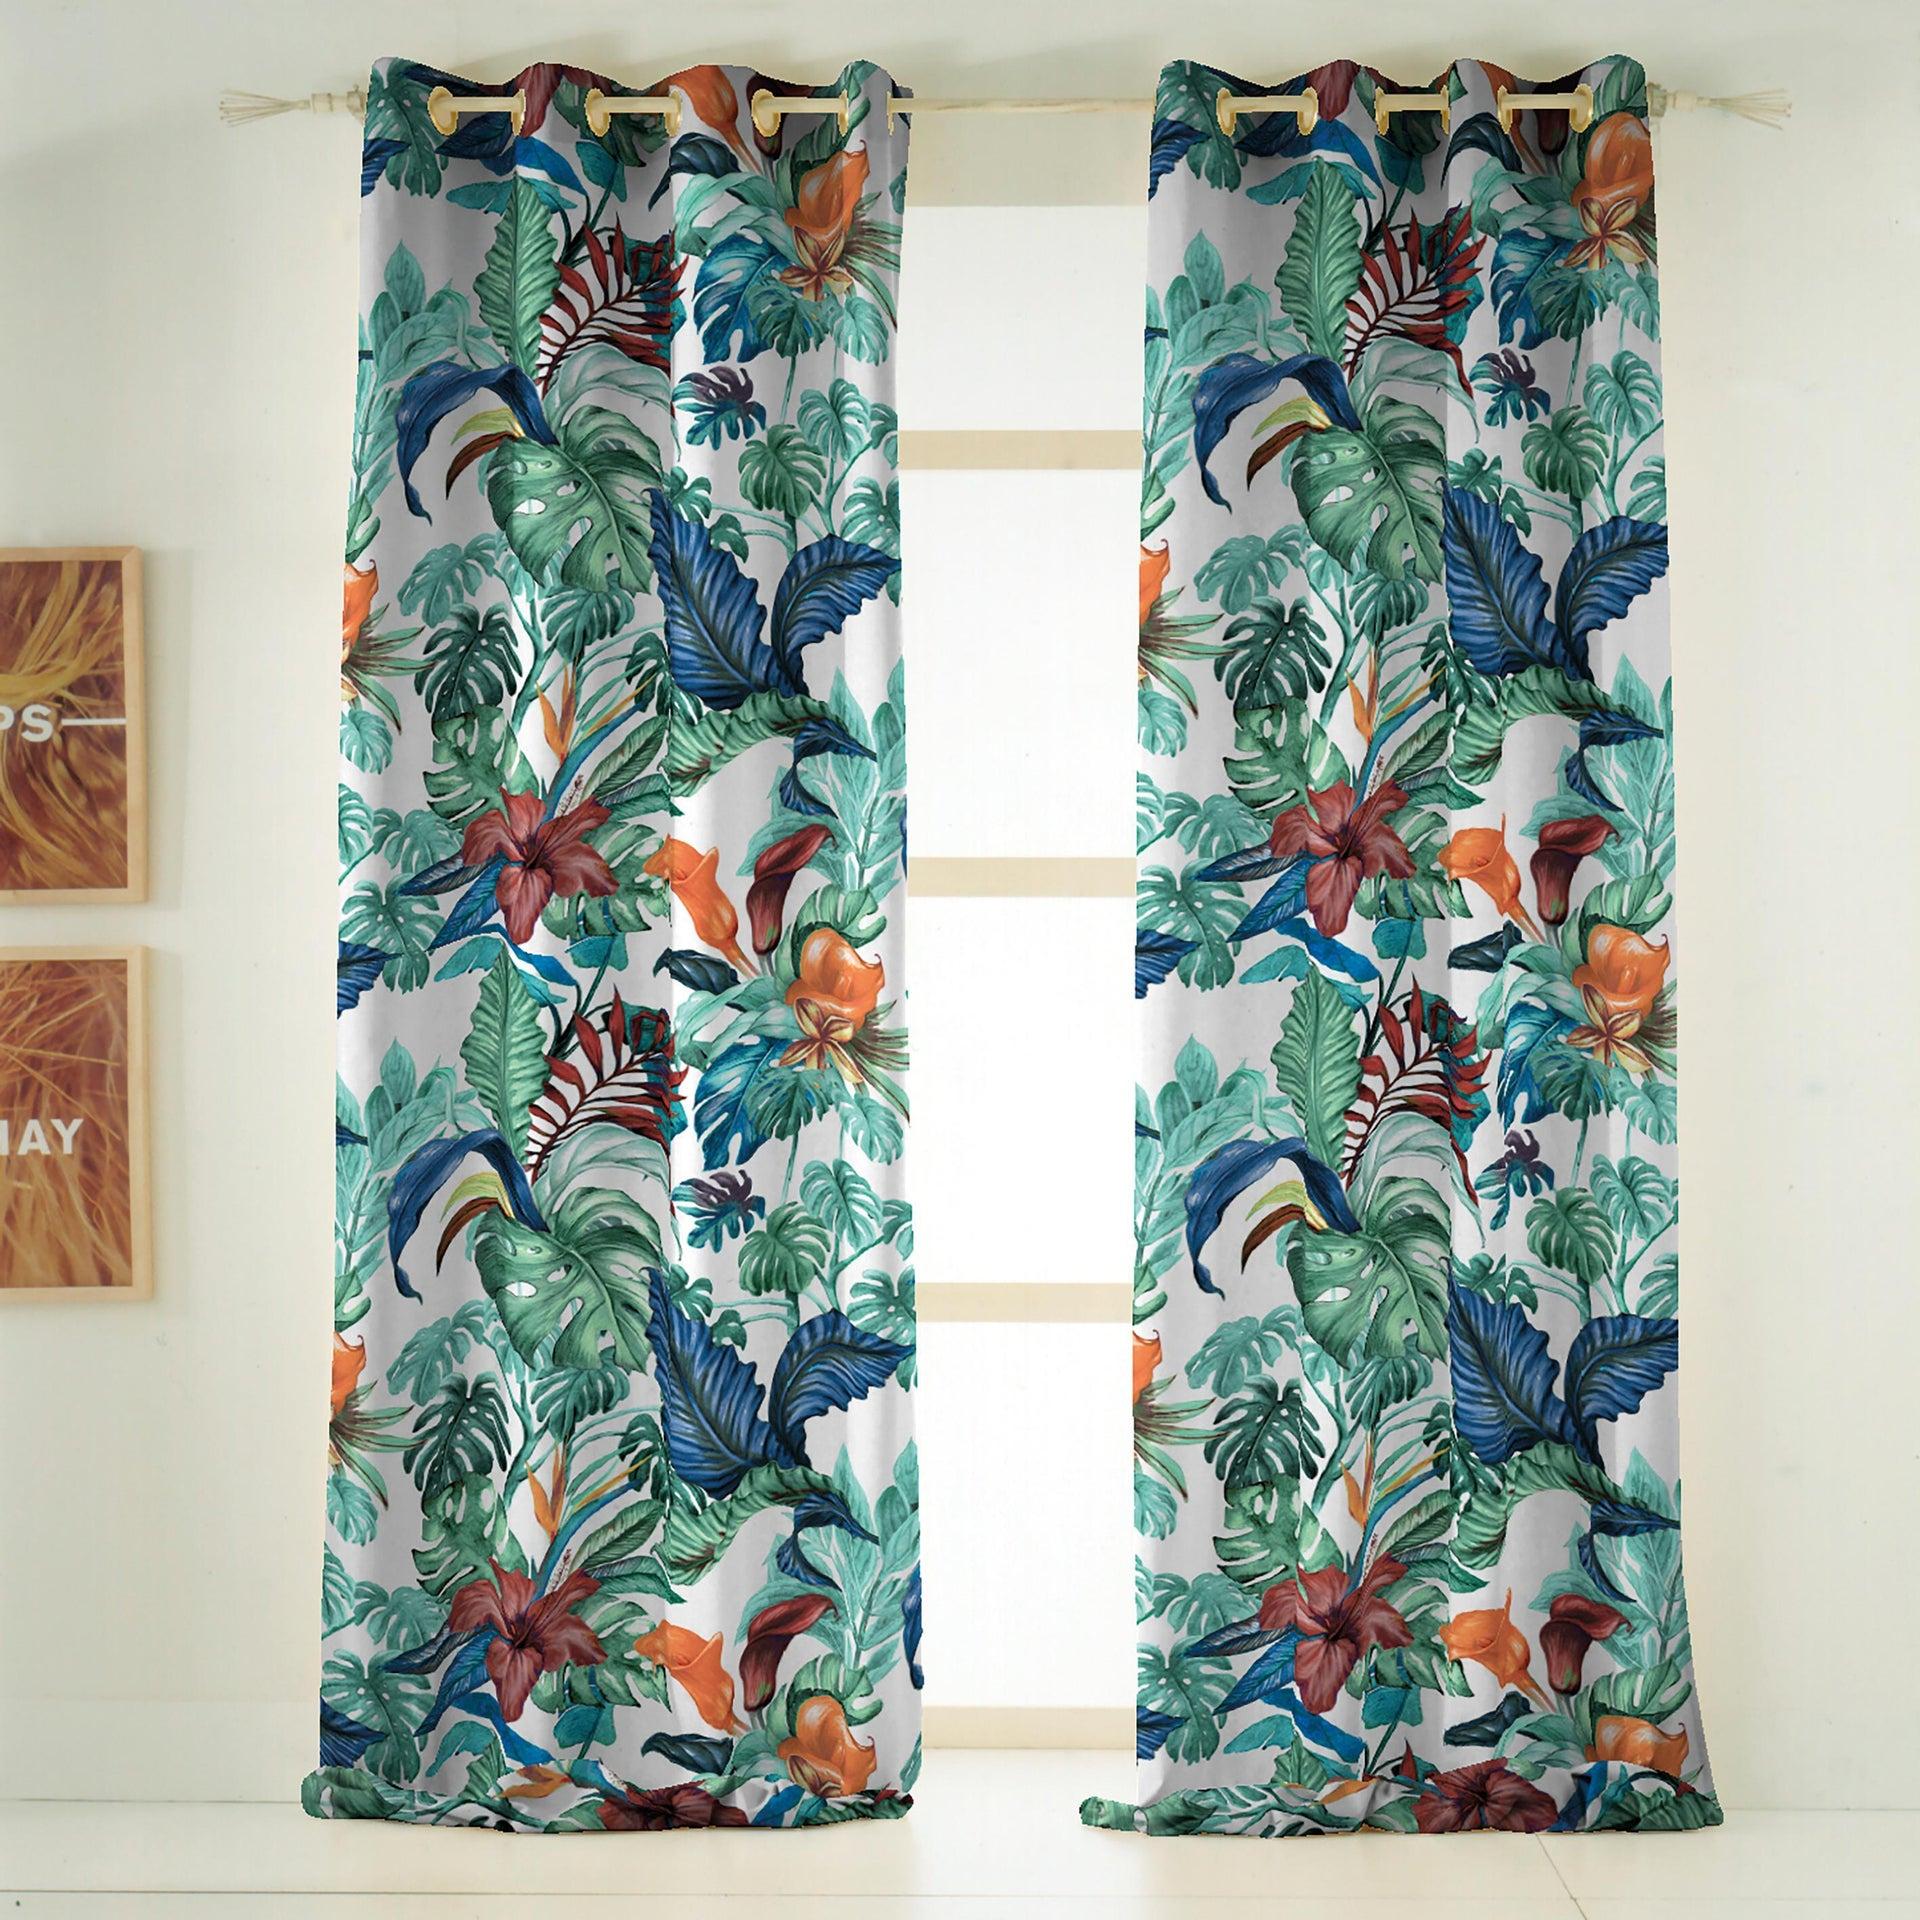 Tenda INSPIRE Malibù verde occhielli 140 x 270 cm - 2